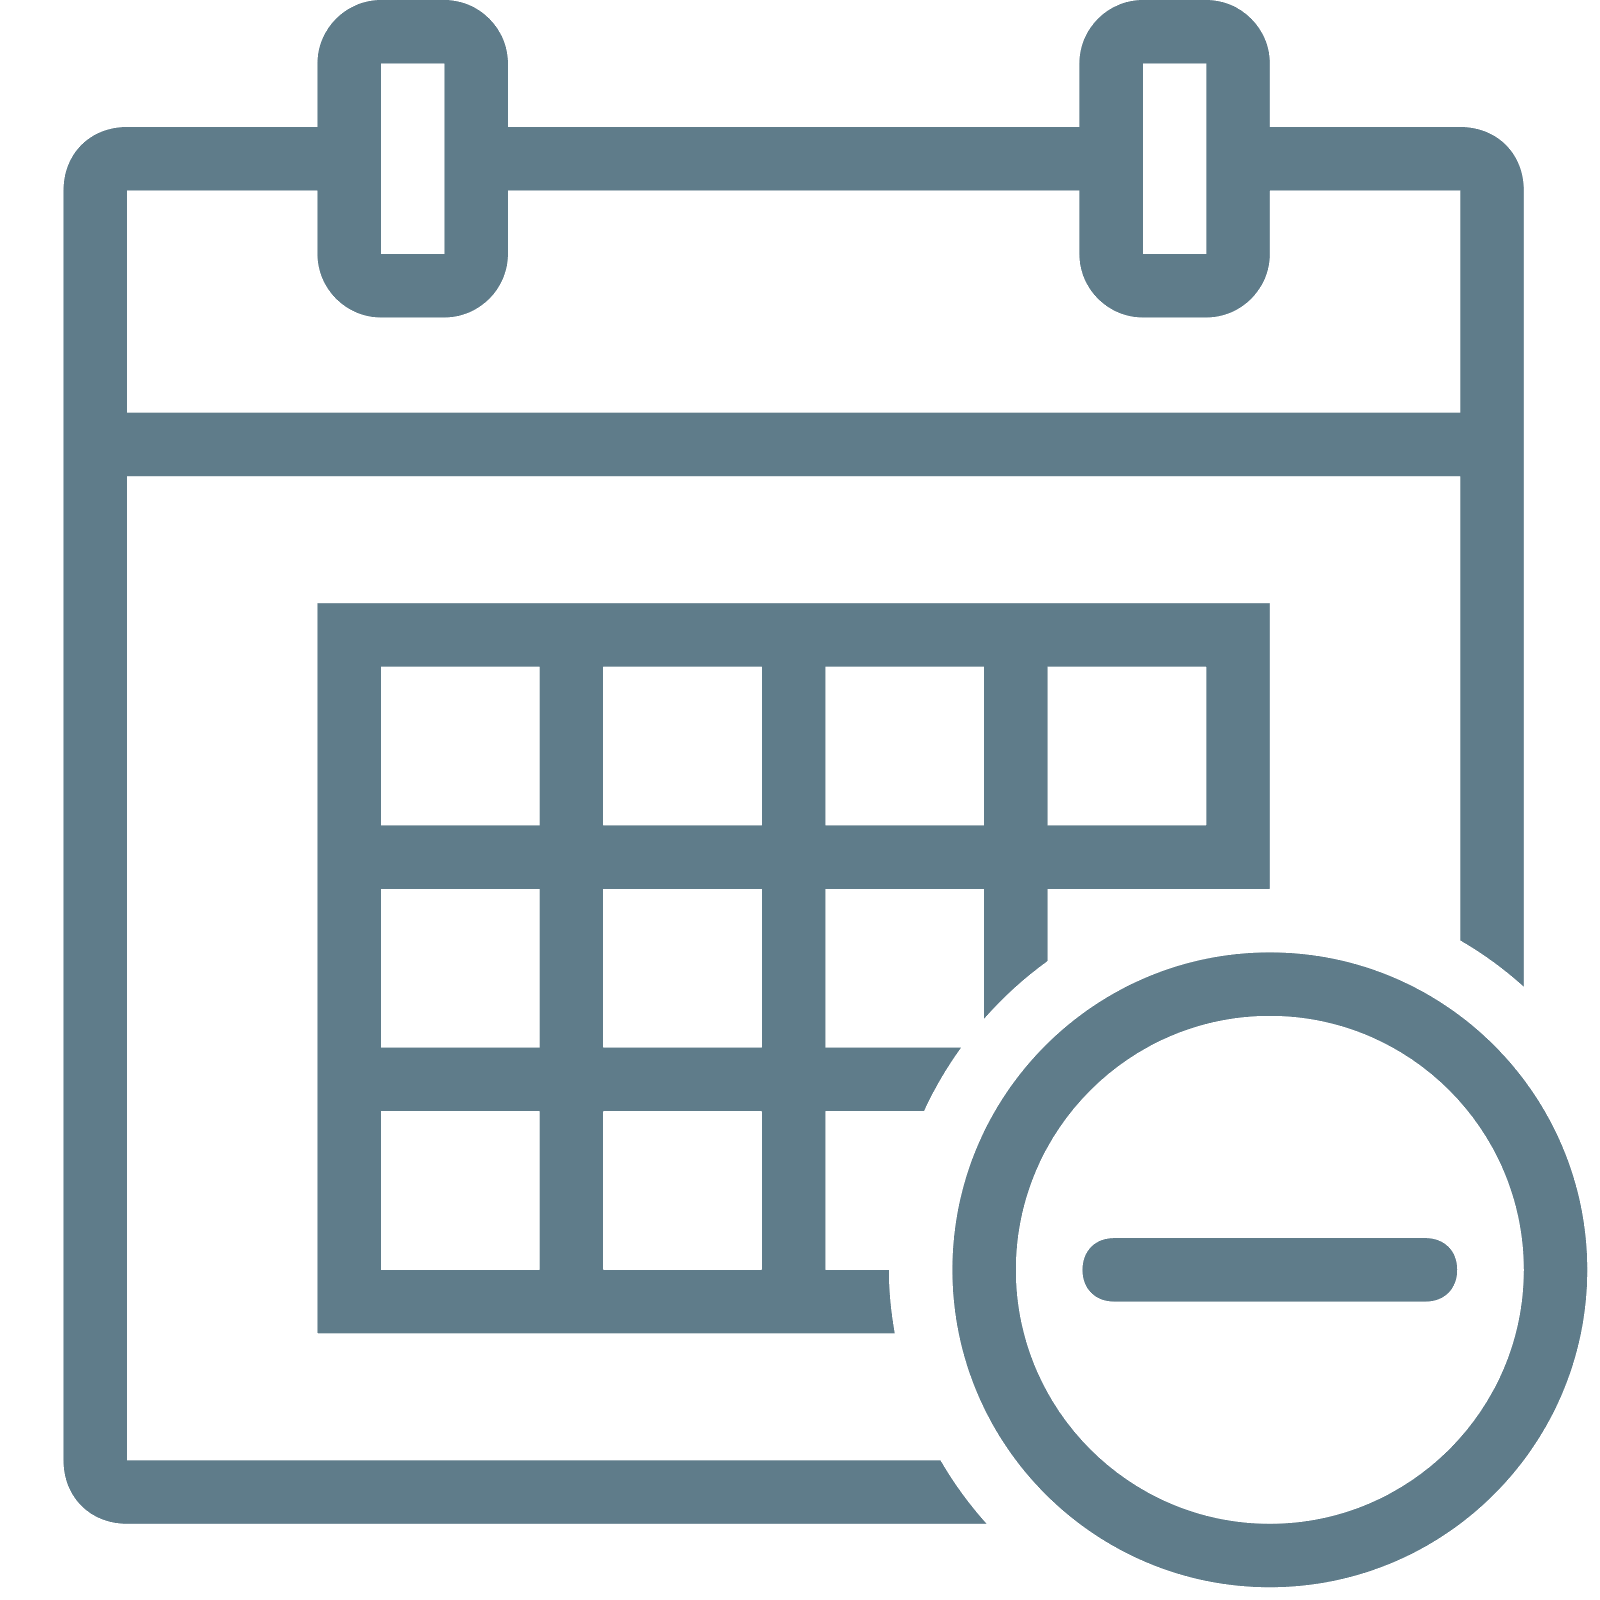 Schedule clipart computer time. Icons calendar clip art